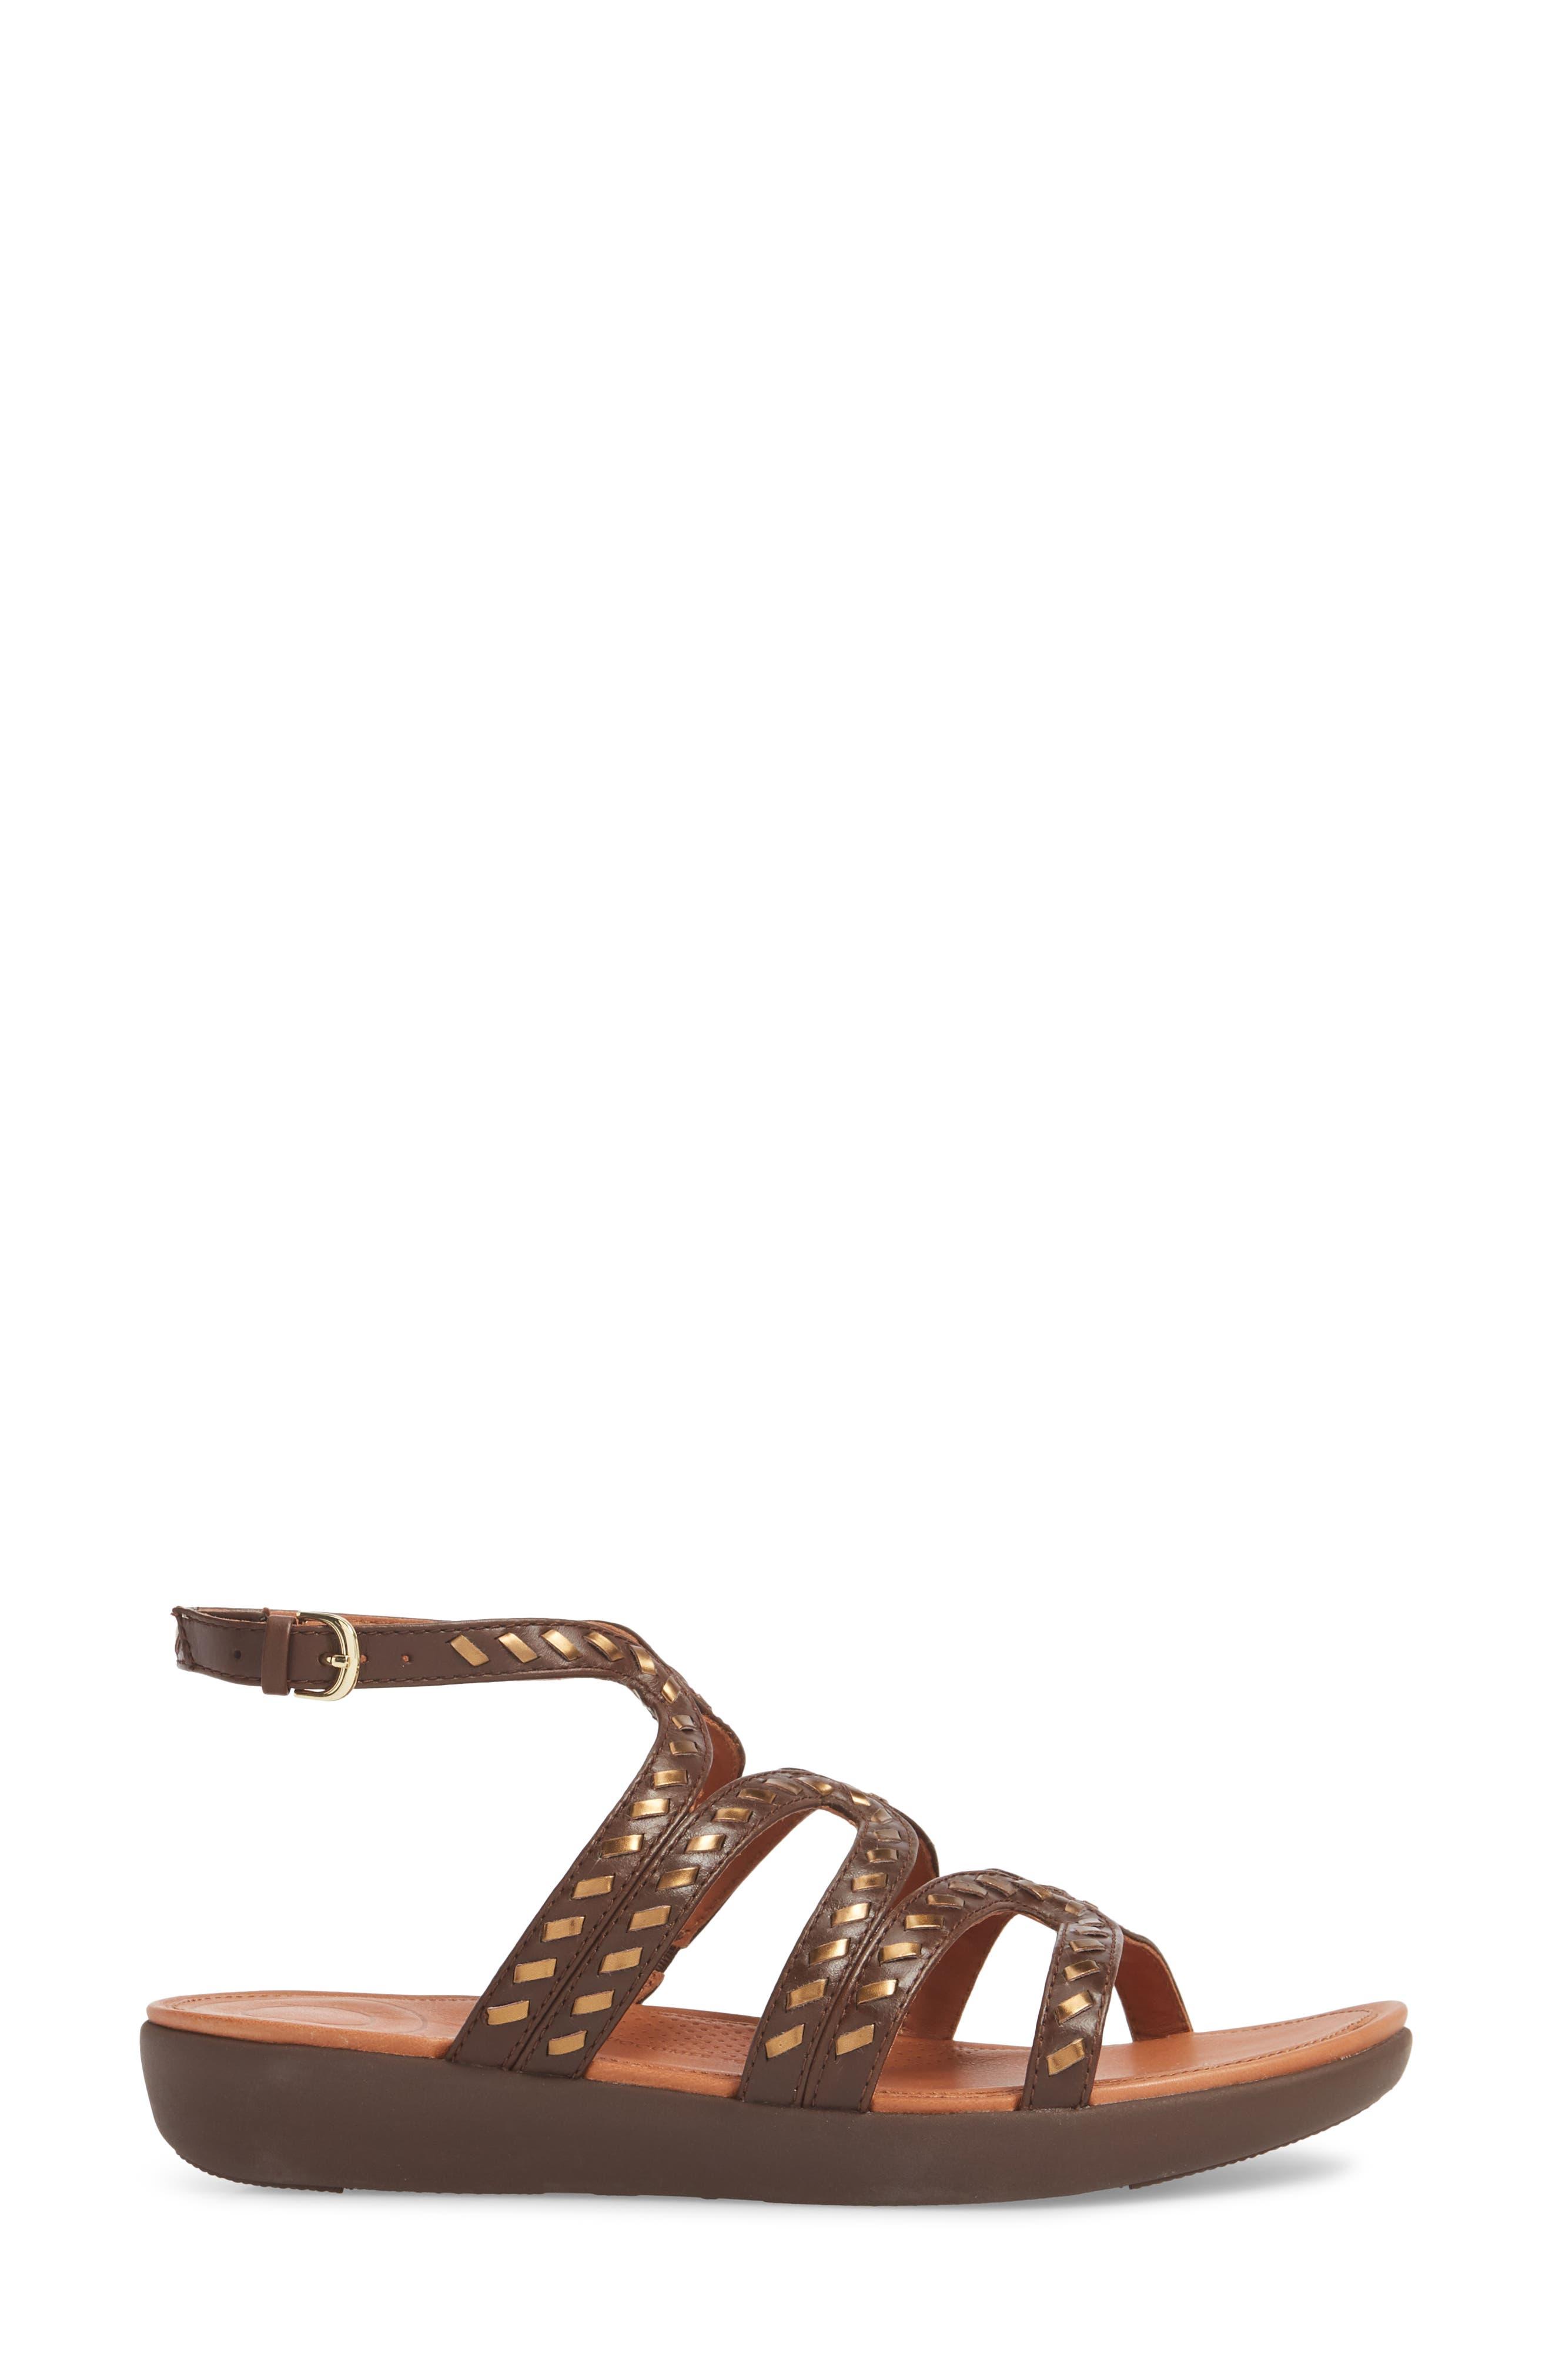 Strata Gladiator Sandal,                             Alternate thumbnail 3, color,                             200